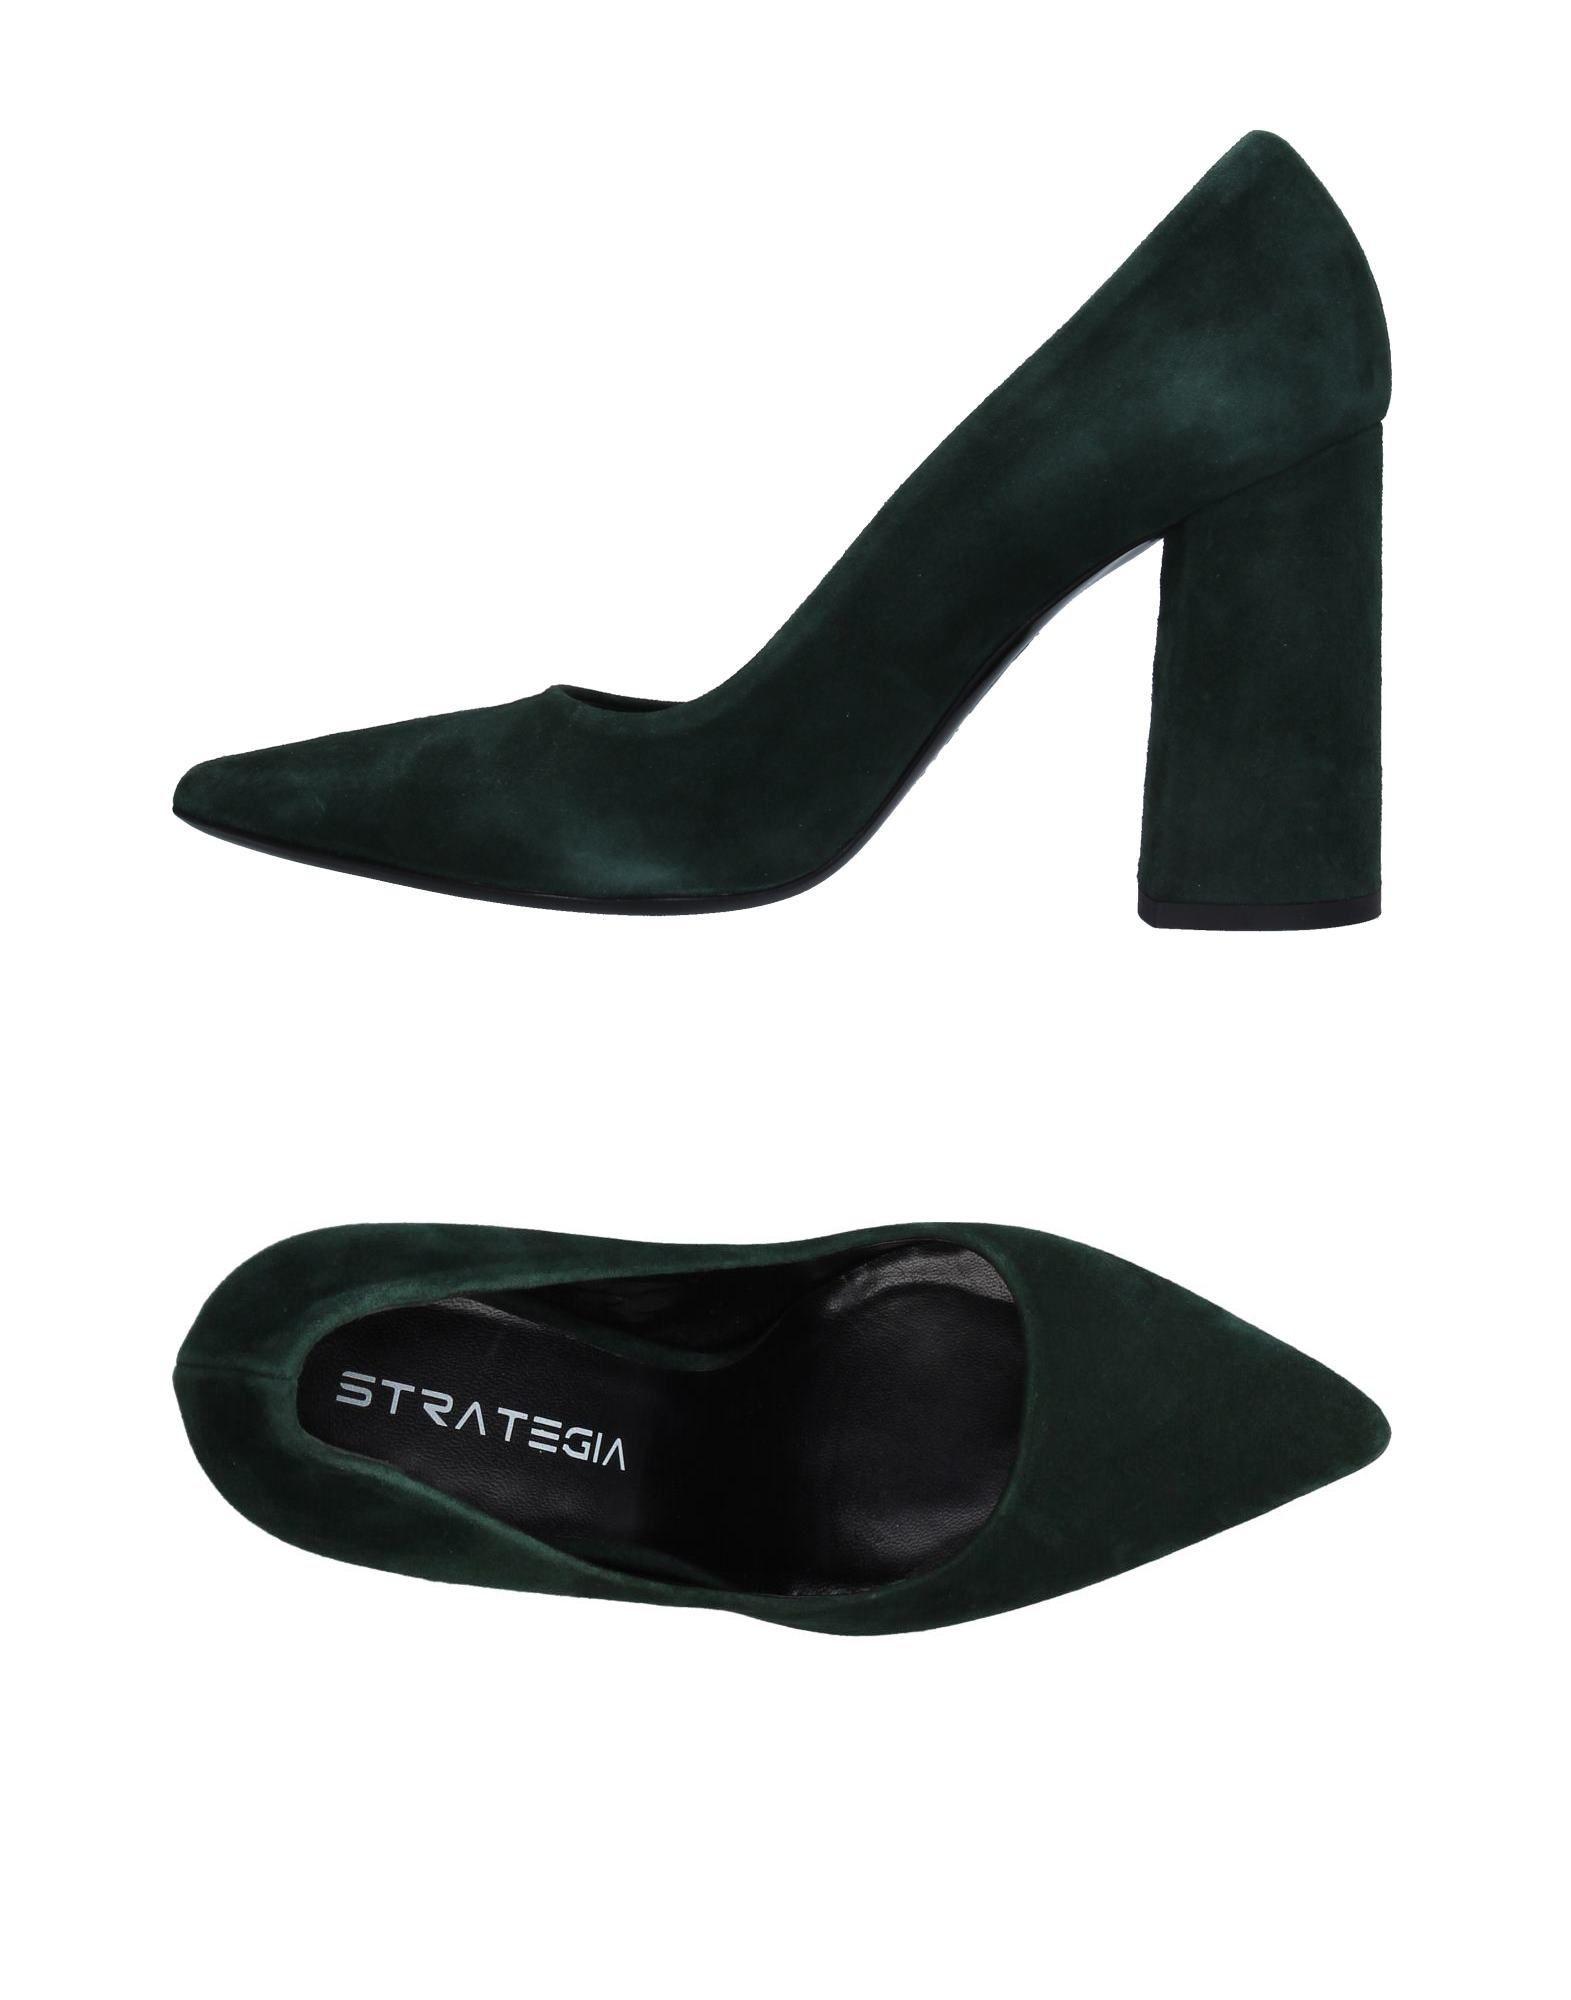 Strategia Pumps Damen  11328063GS Gute Qualität beliebte Schuhe